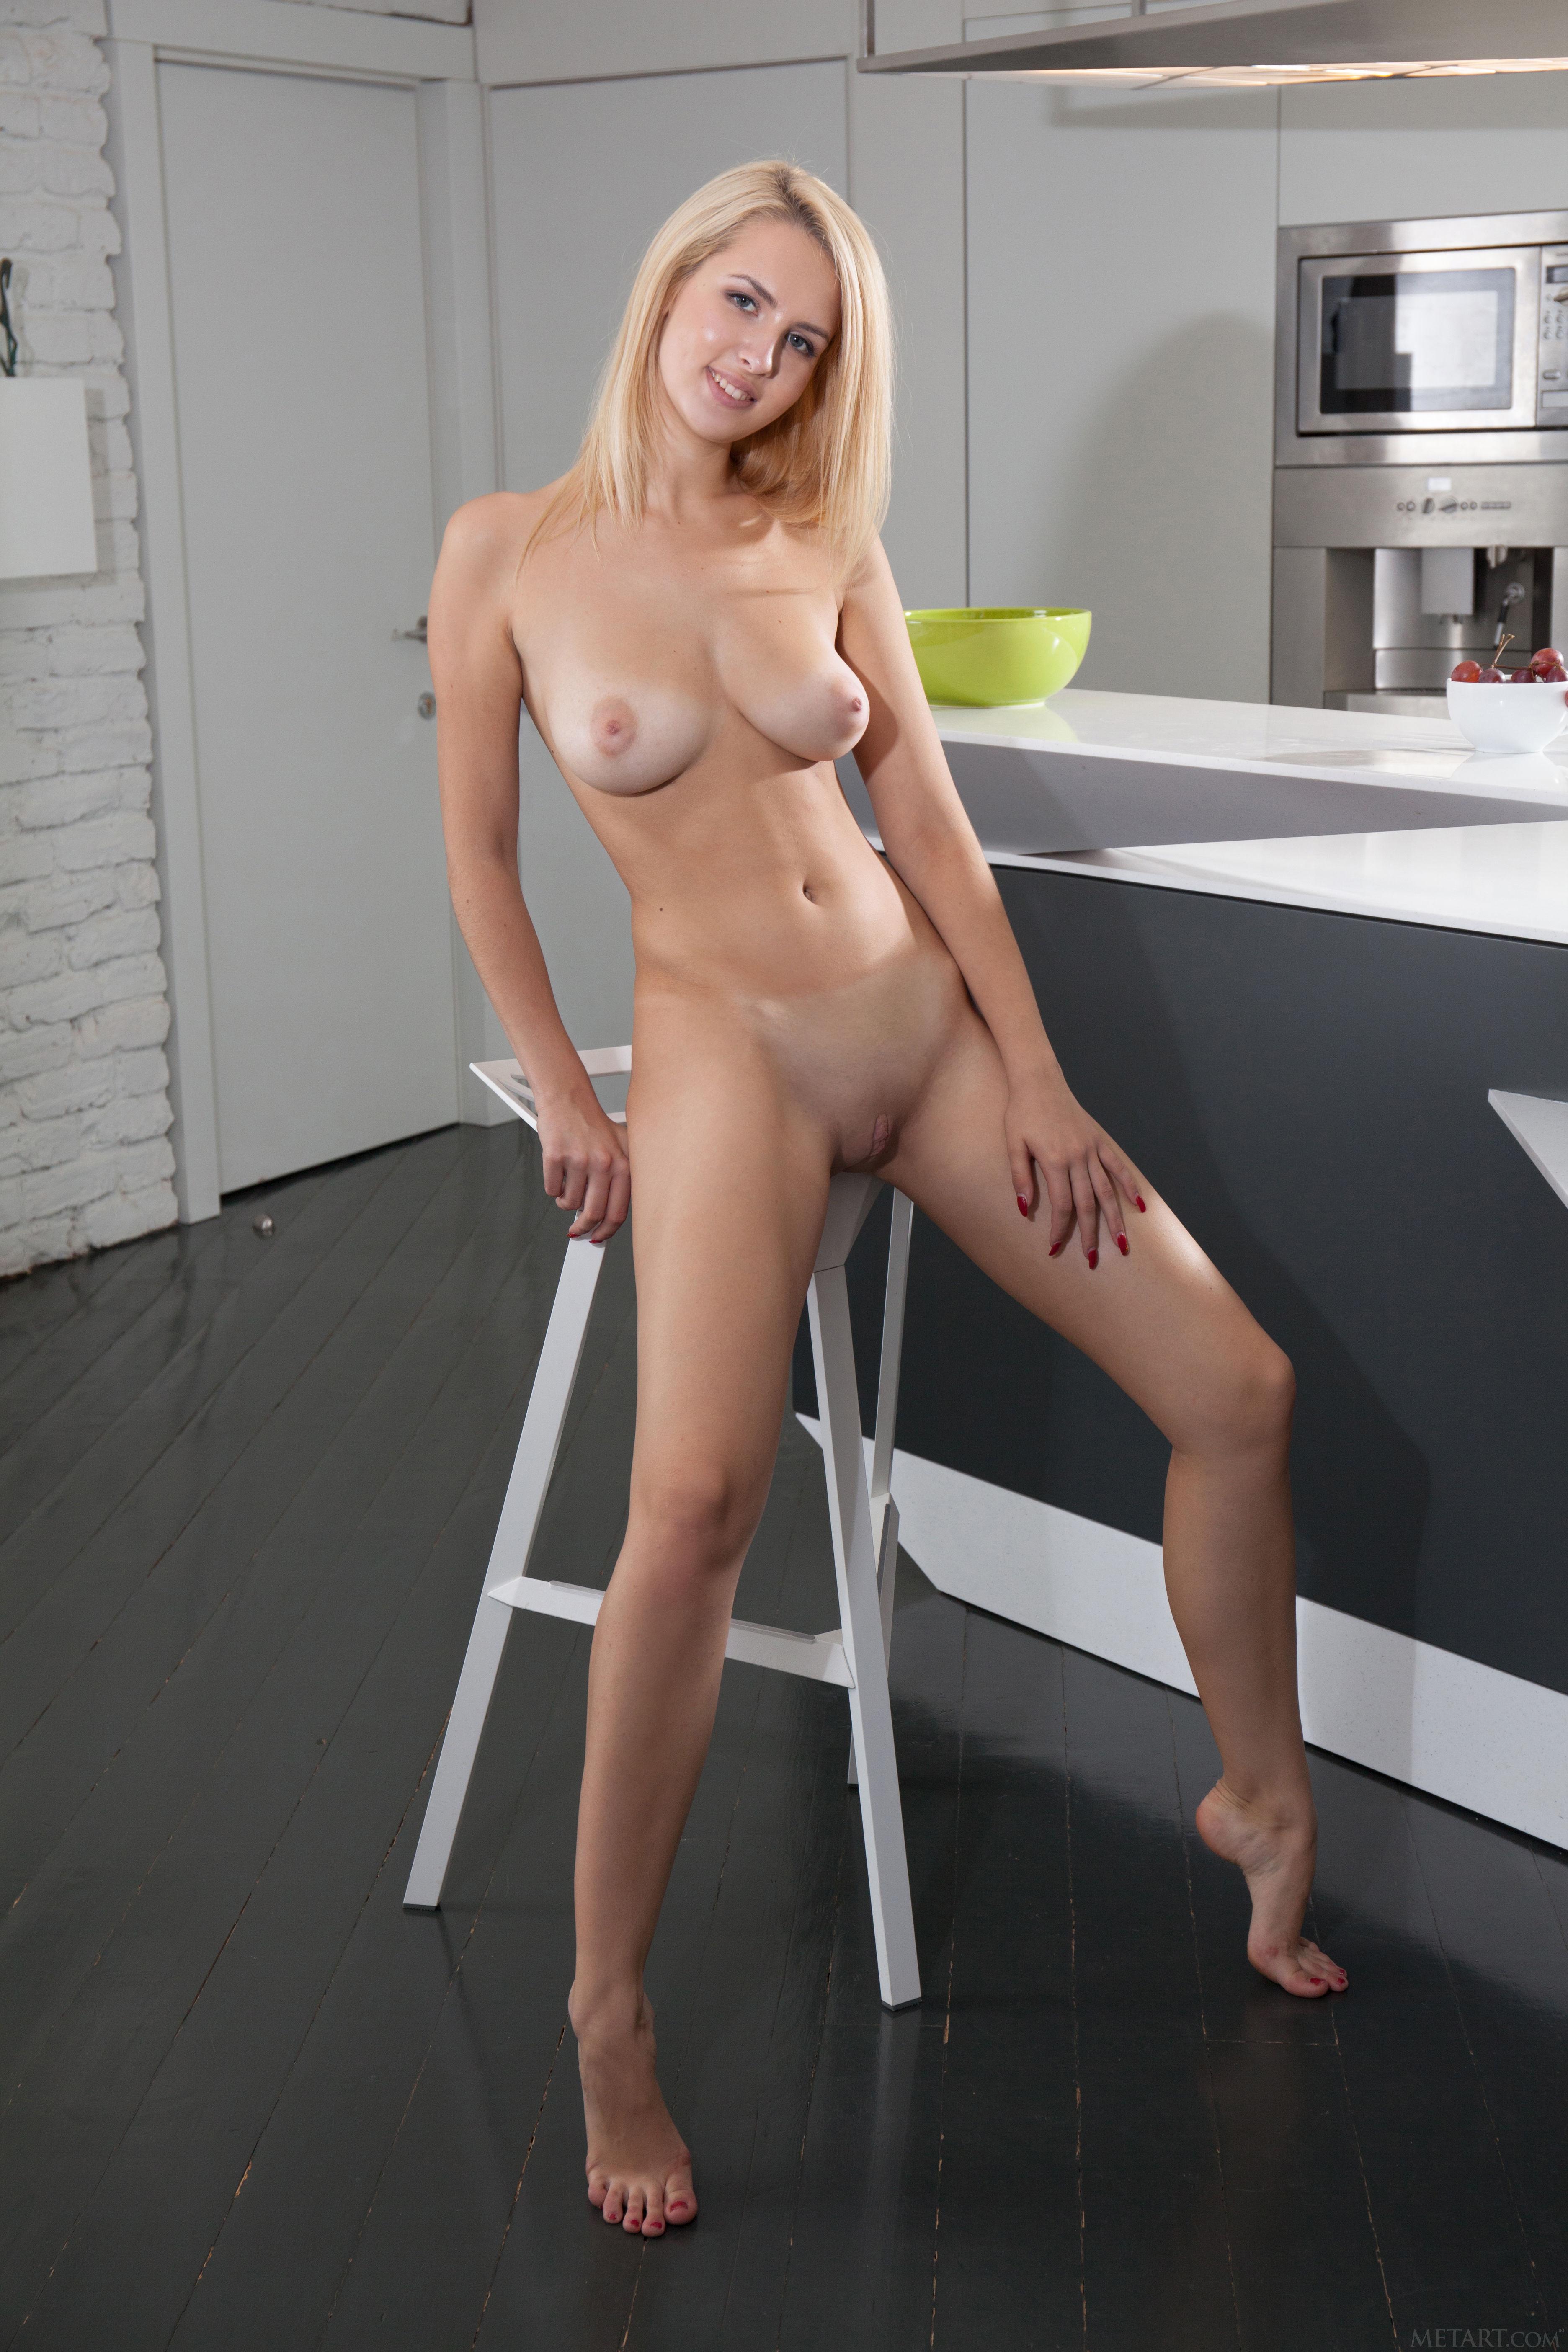 ninel conde nude fuckin